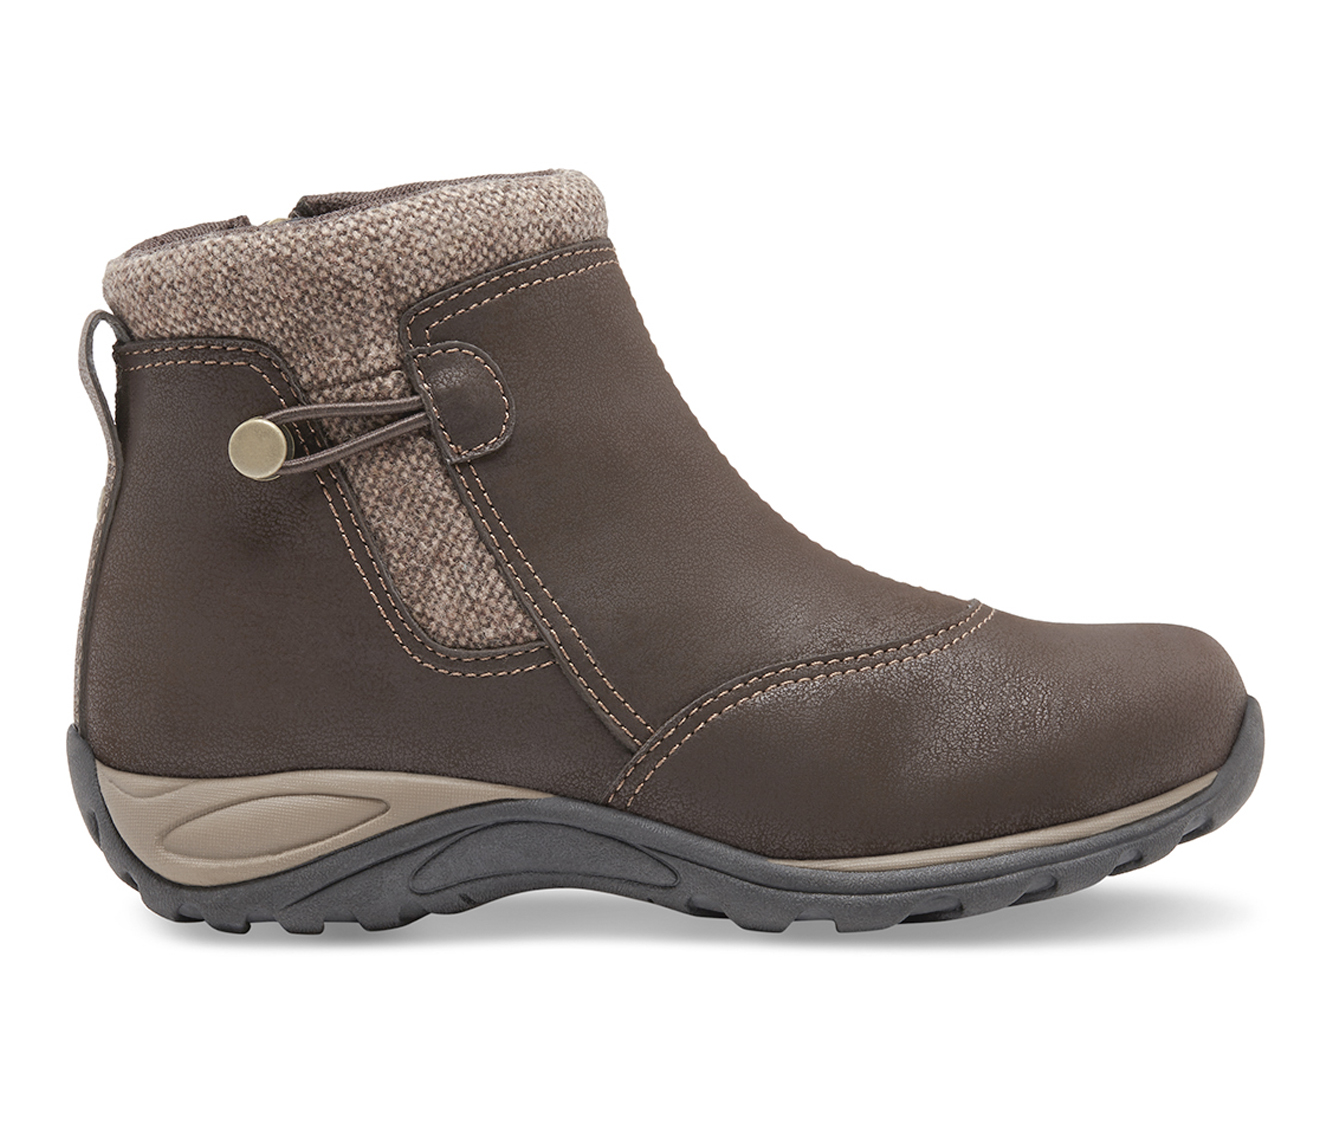 Eastland Bridget Women's Boots (Brown - Leather)